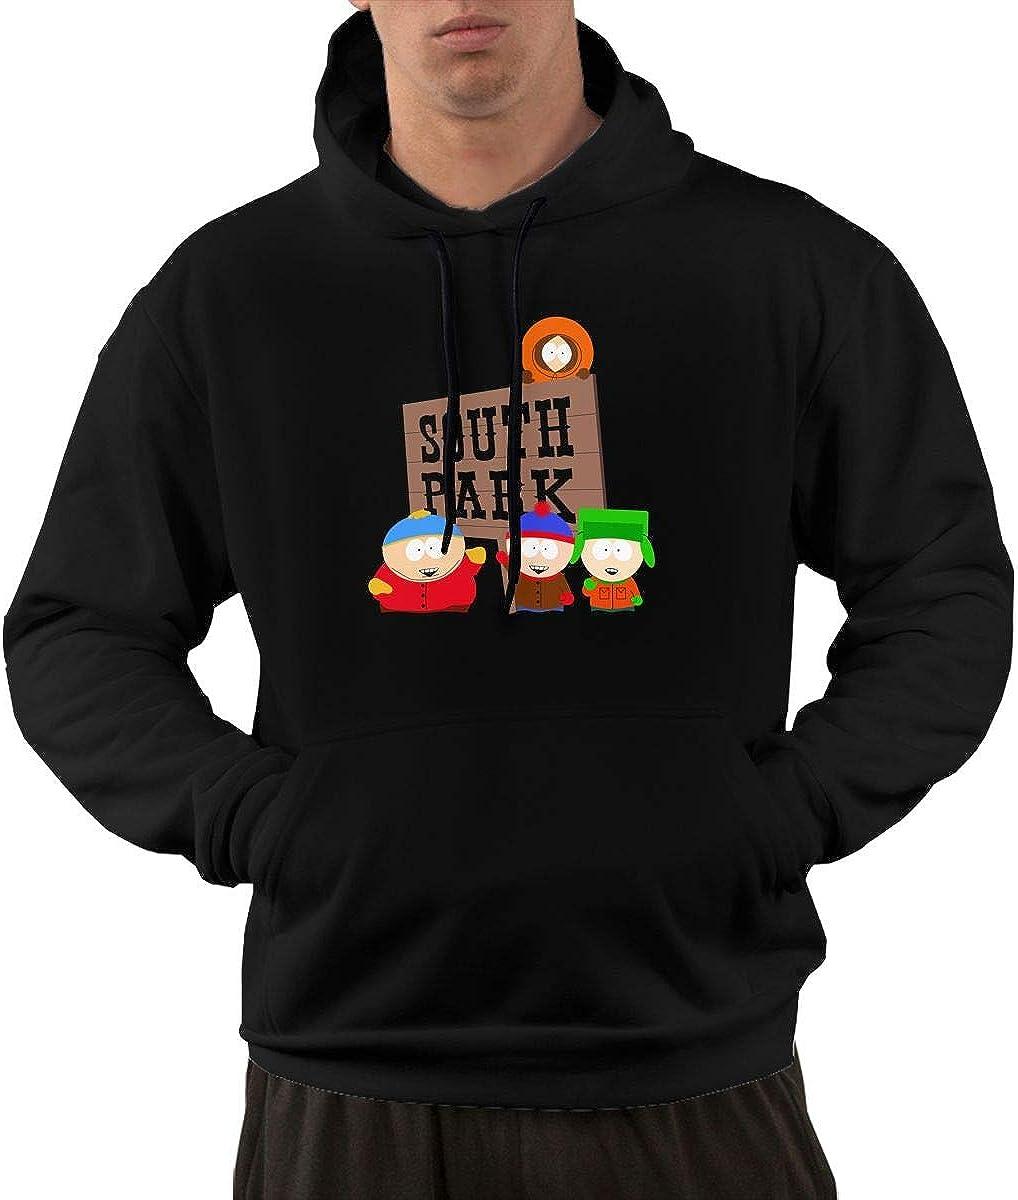 AlbertV Men's South Park Hoodies Sweater with Pocket Black